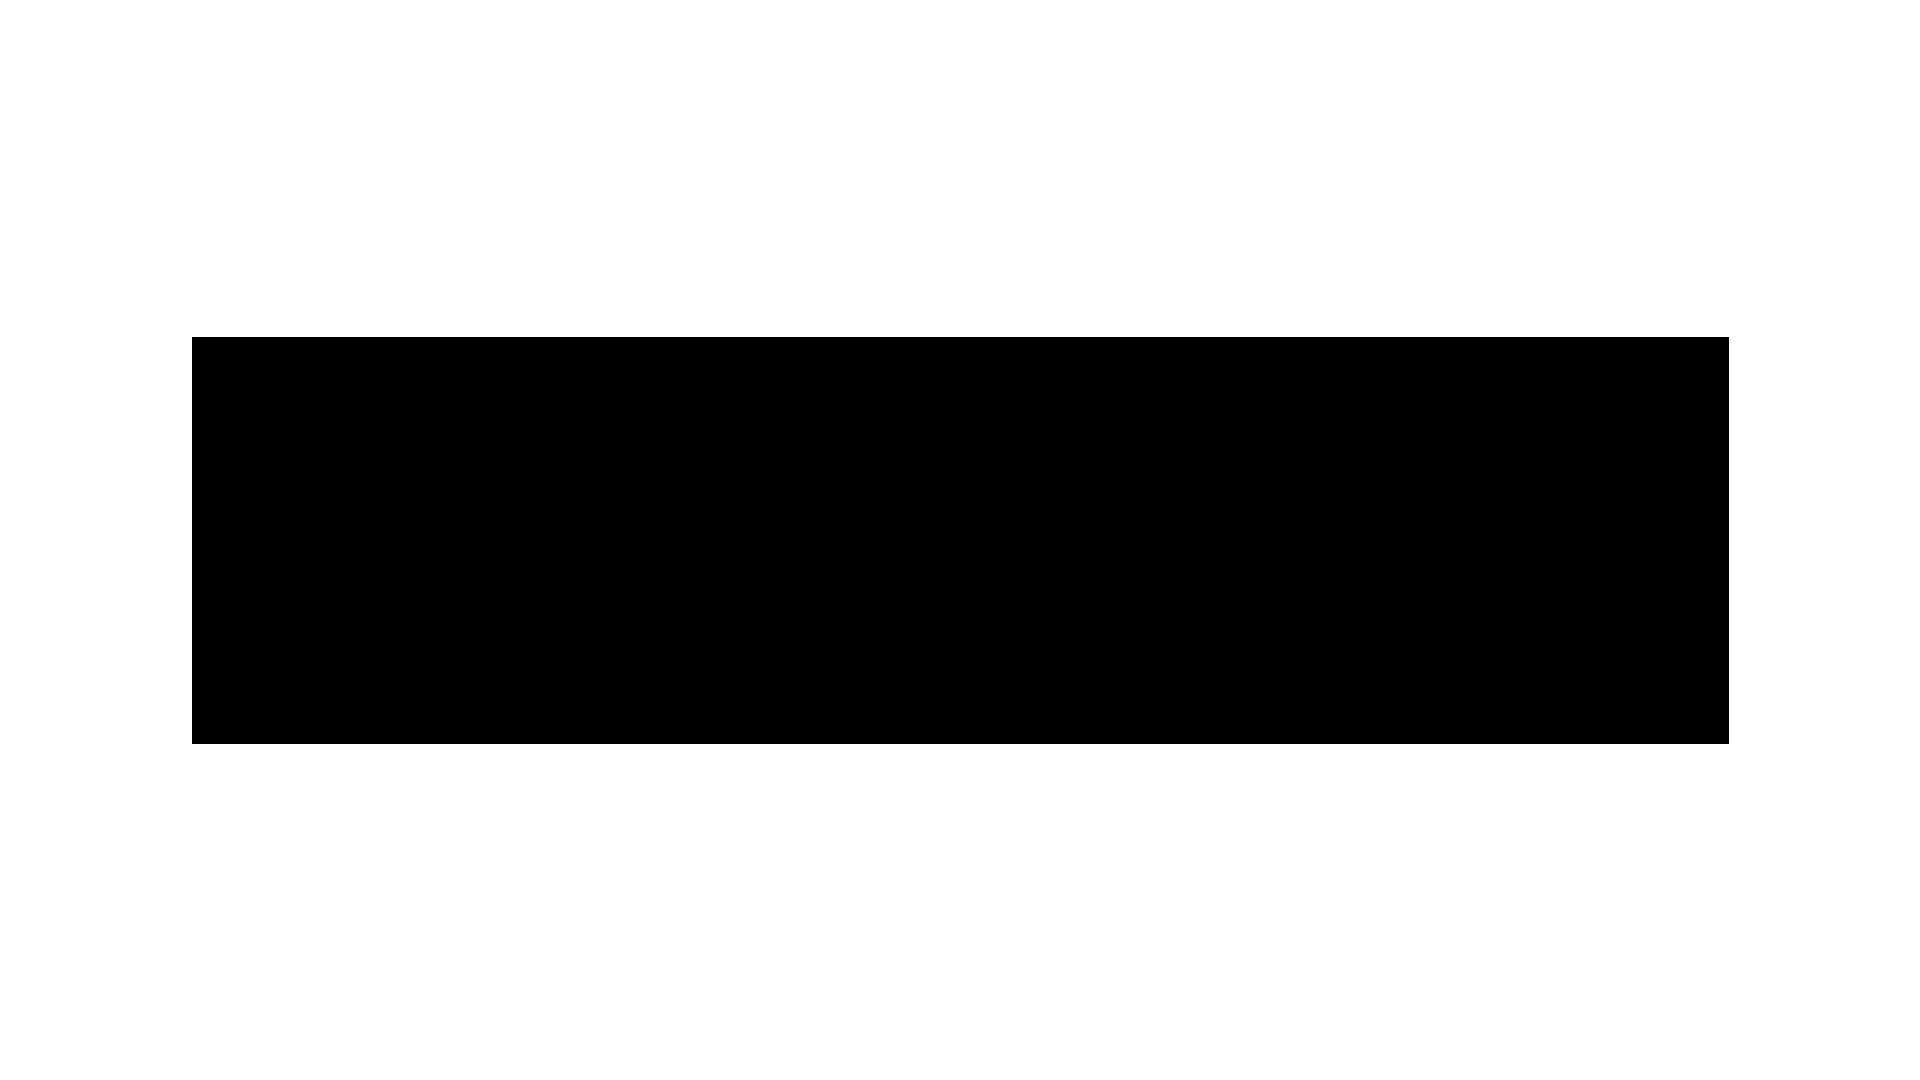 CMXX_CLEAN_LOGO_BLACK.png